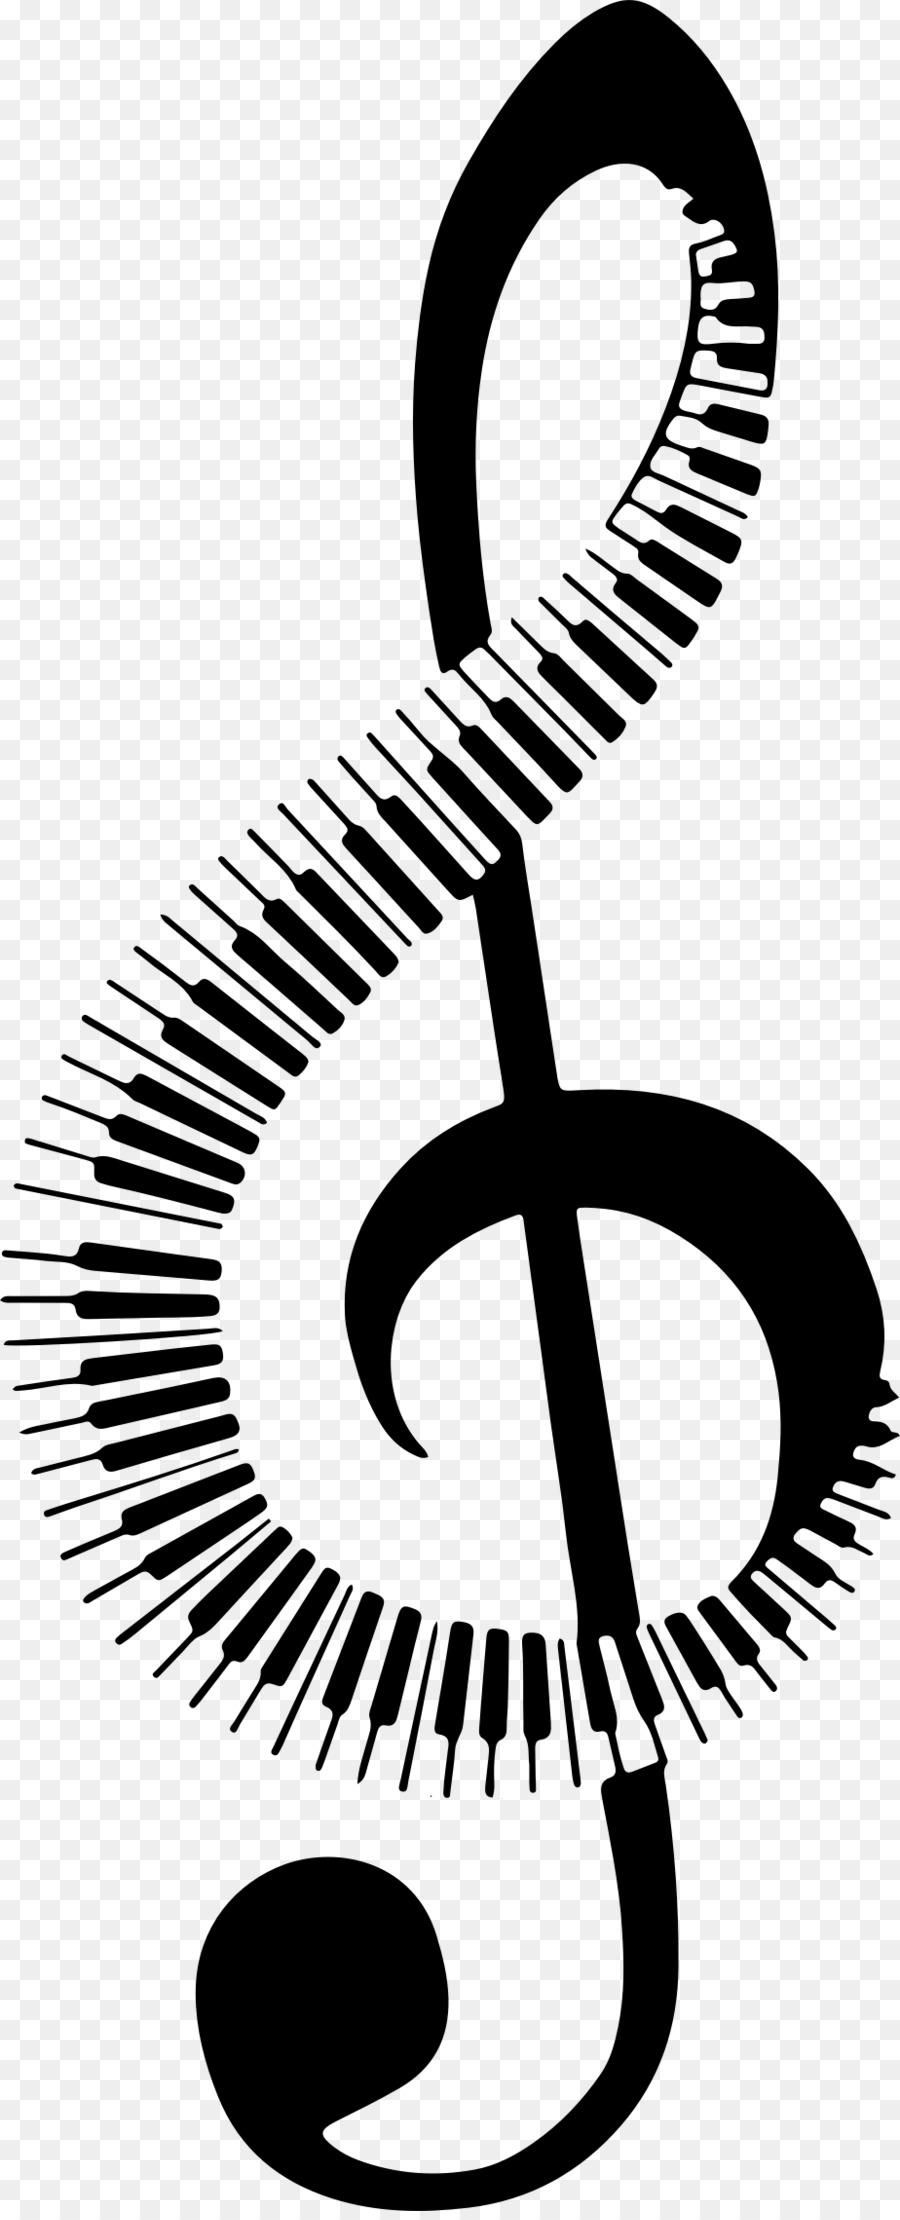 musical note piano clip art